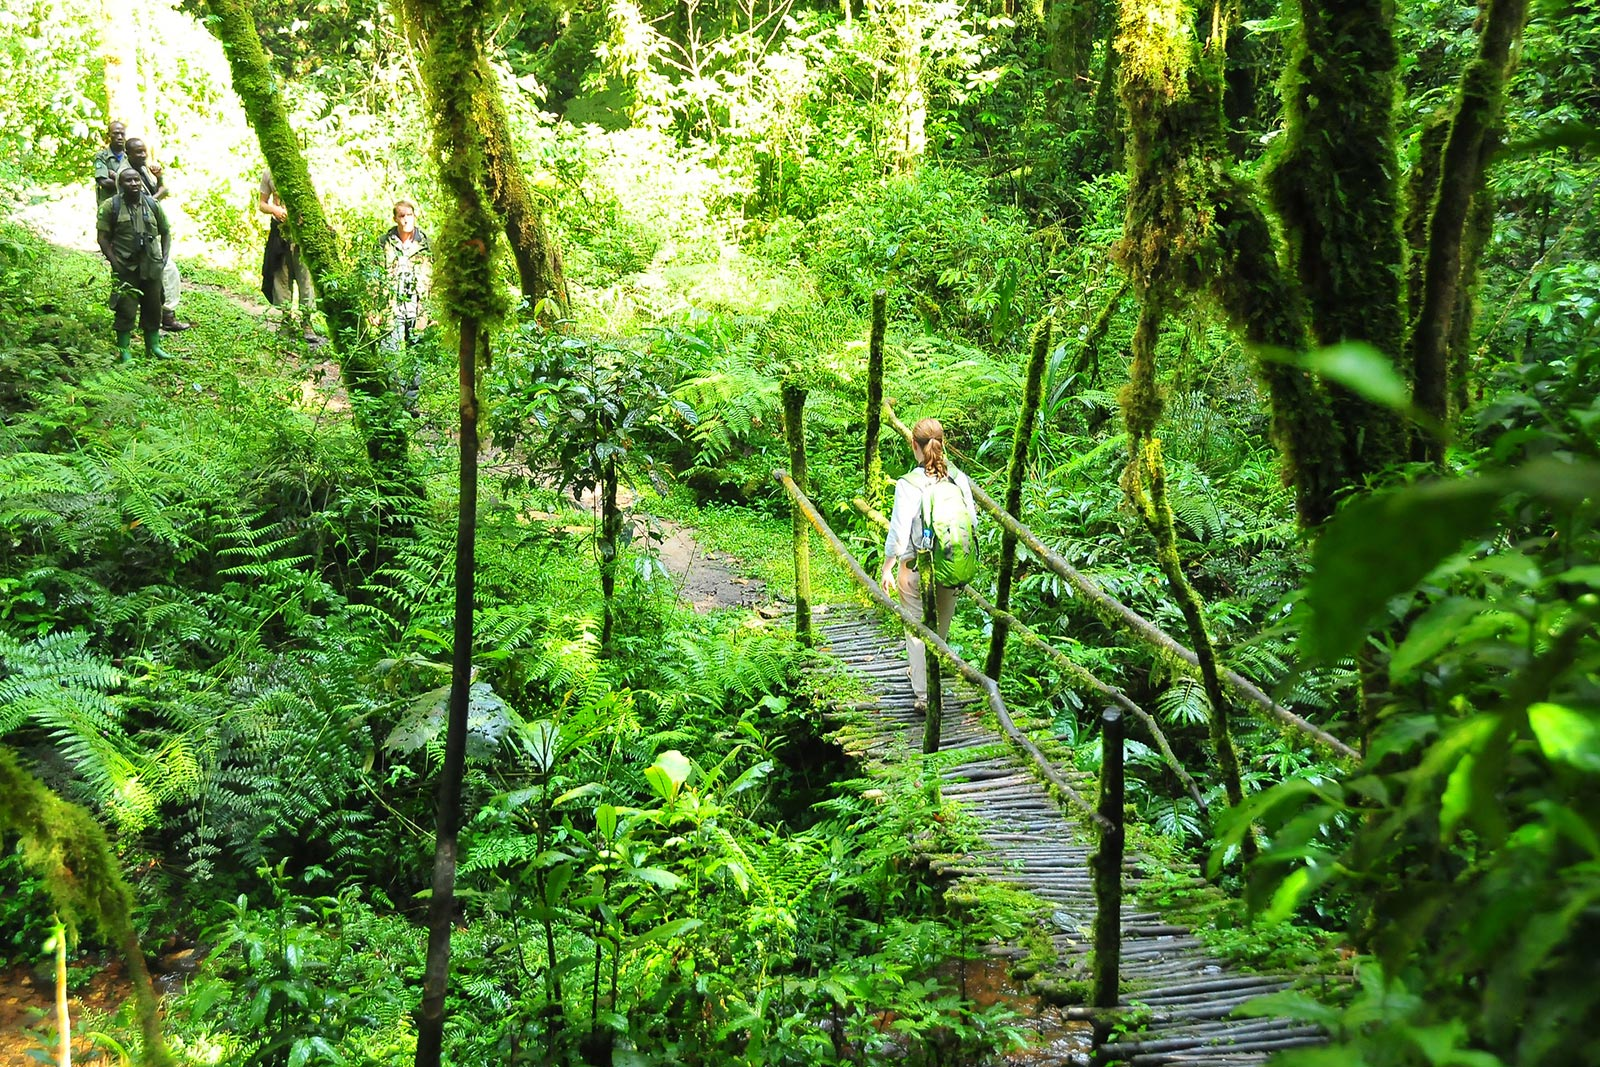 Day 5: Hike Across Bwindi & Transfer to Queen Elizabeth National Park